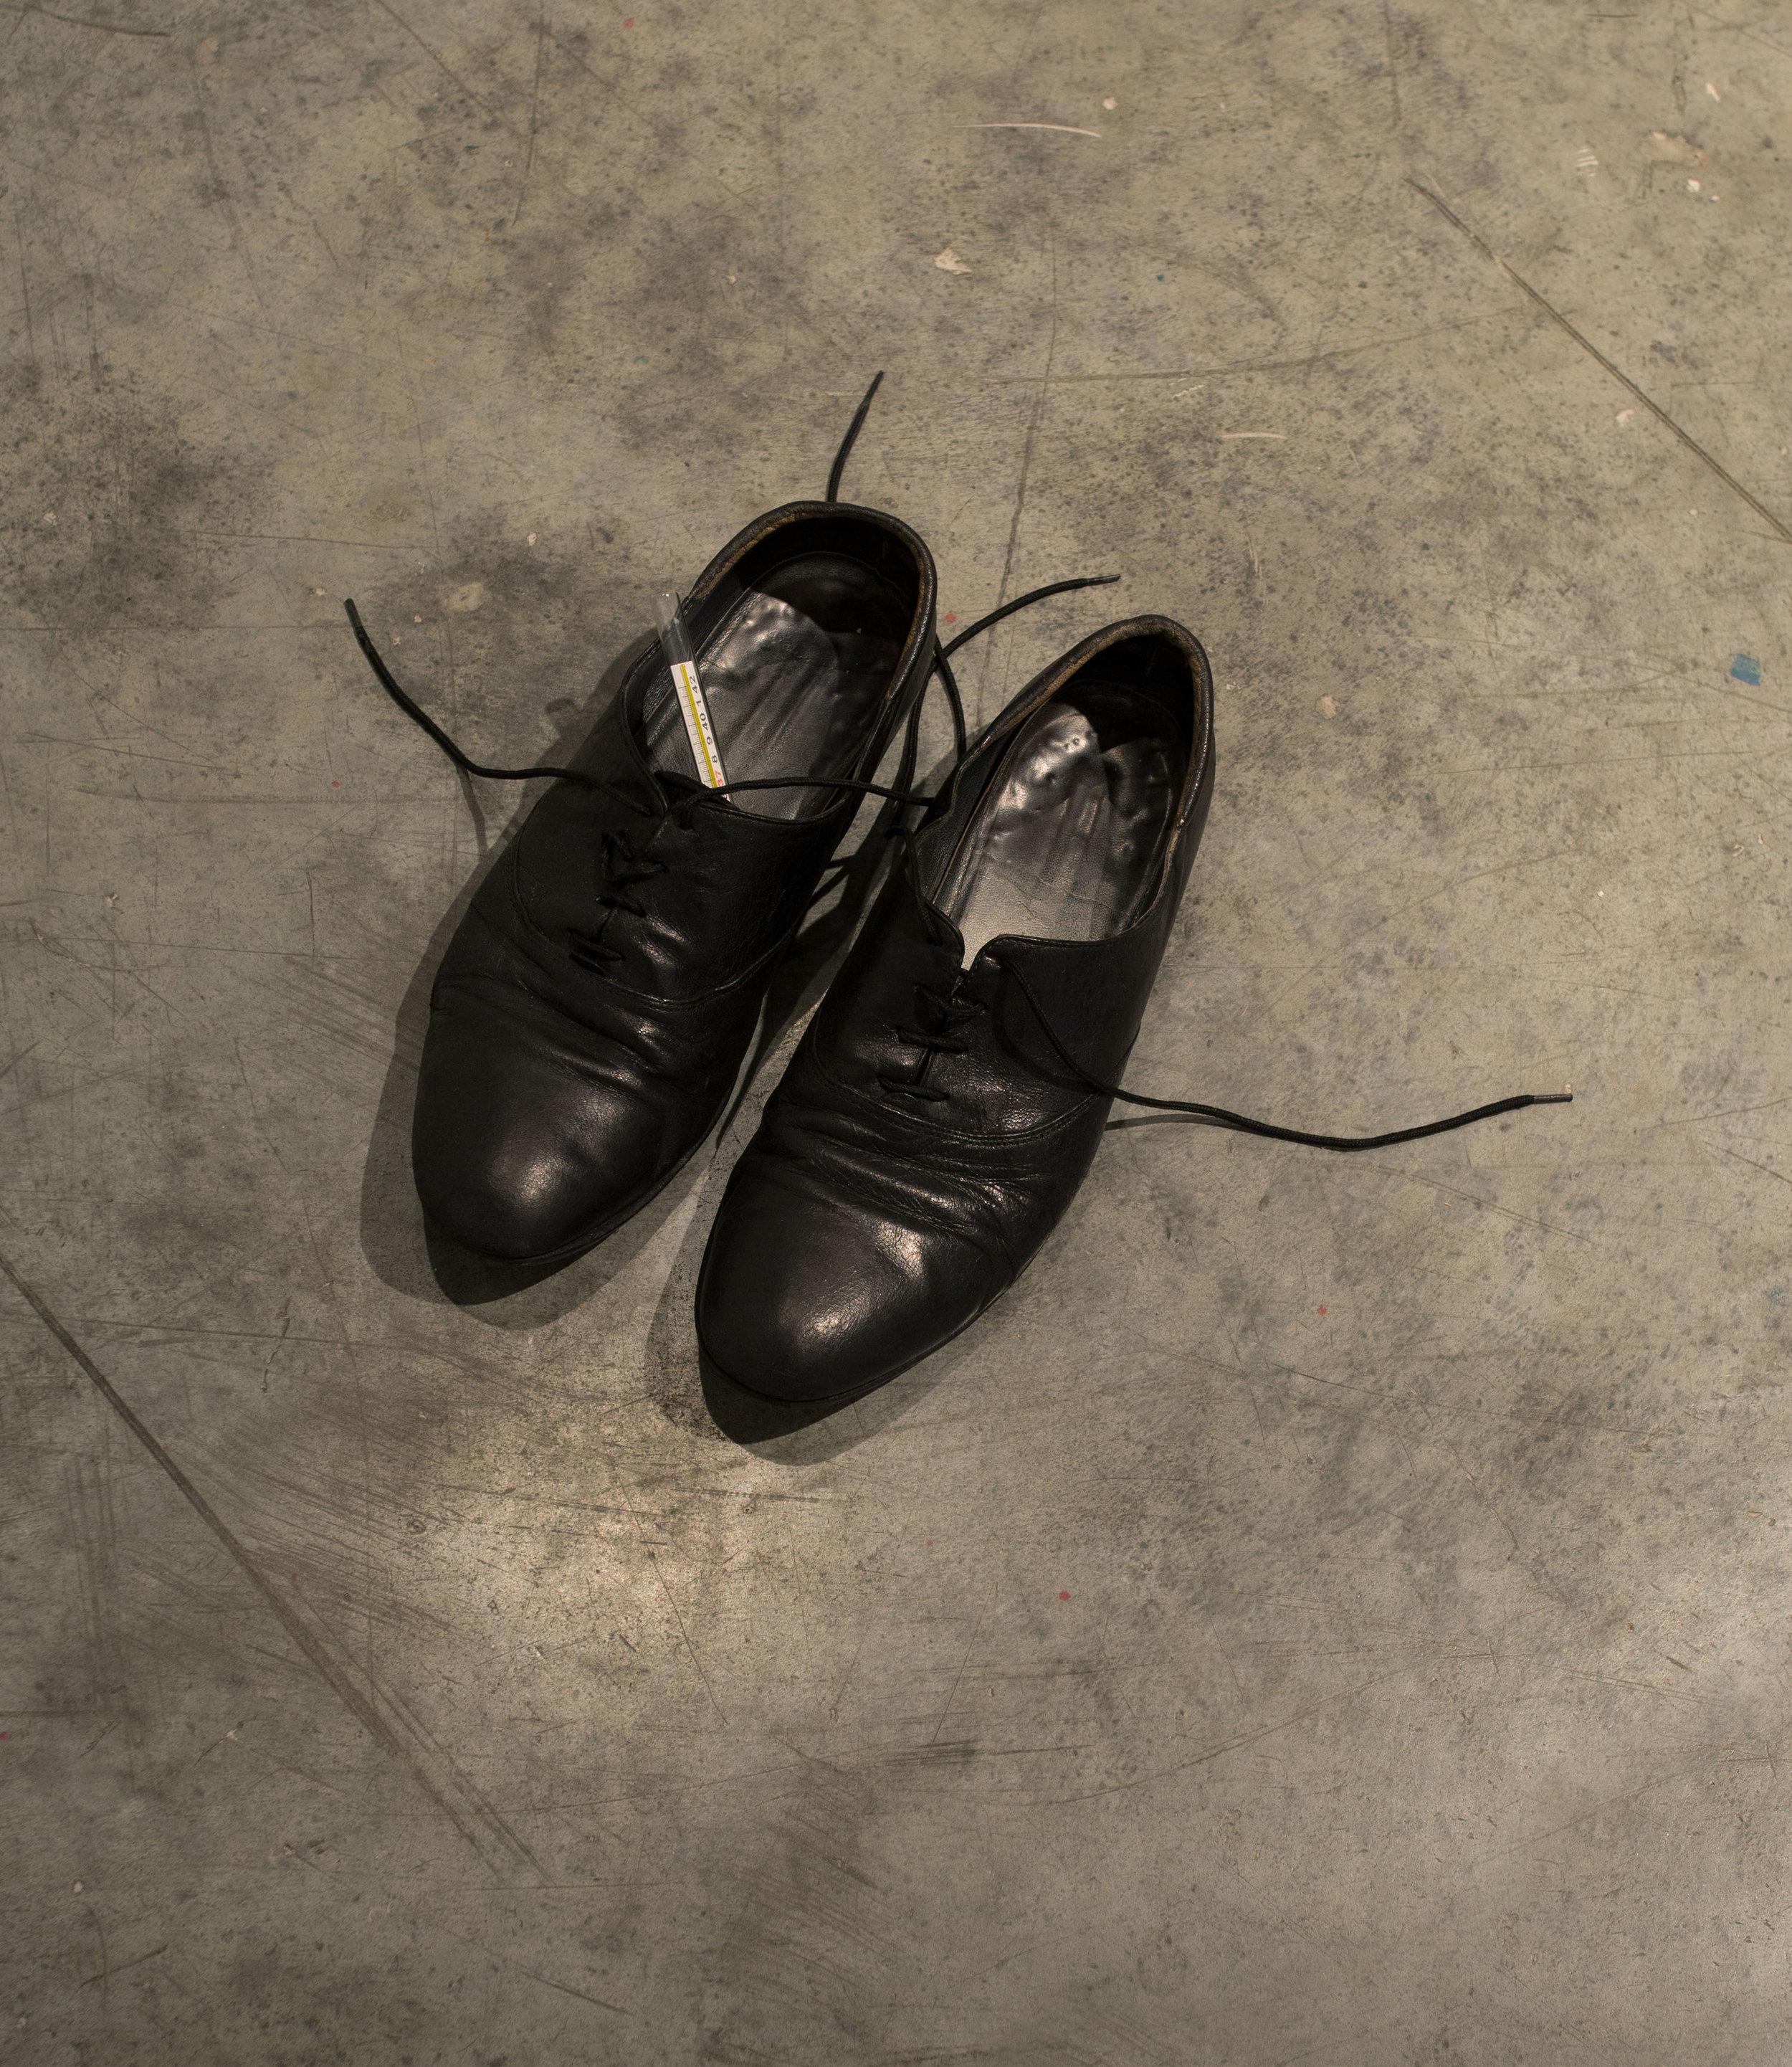 Charbel-joseph H. Boutros, Untitled until now